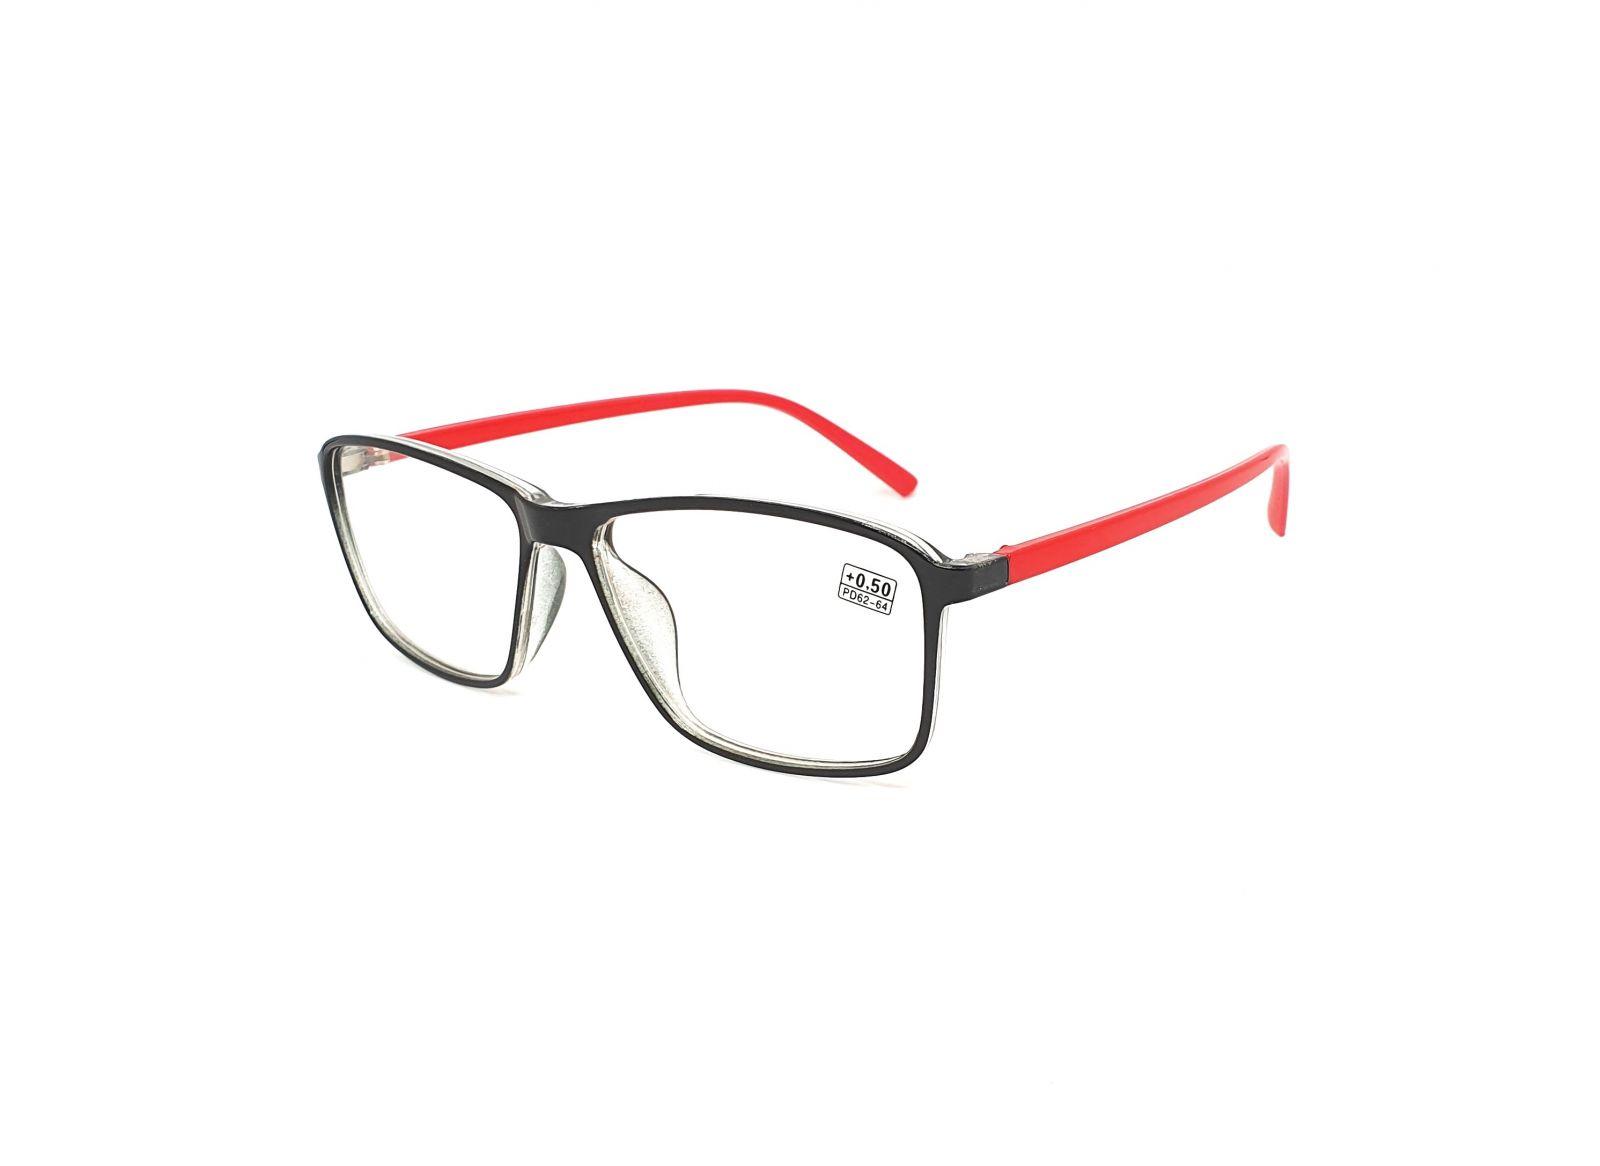 Dioptrické brýle 17218 / +1,50 red